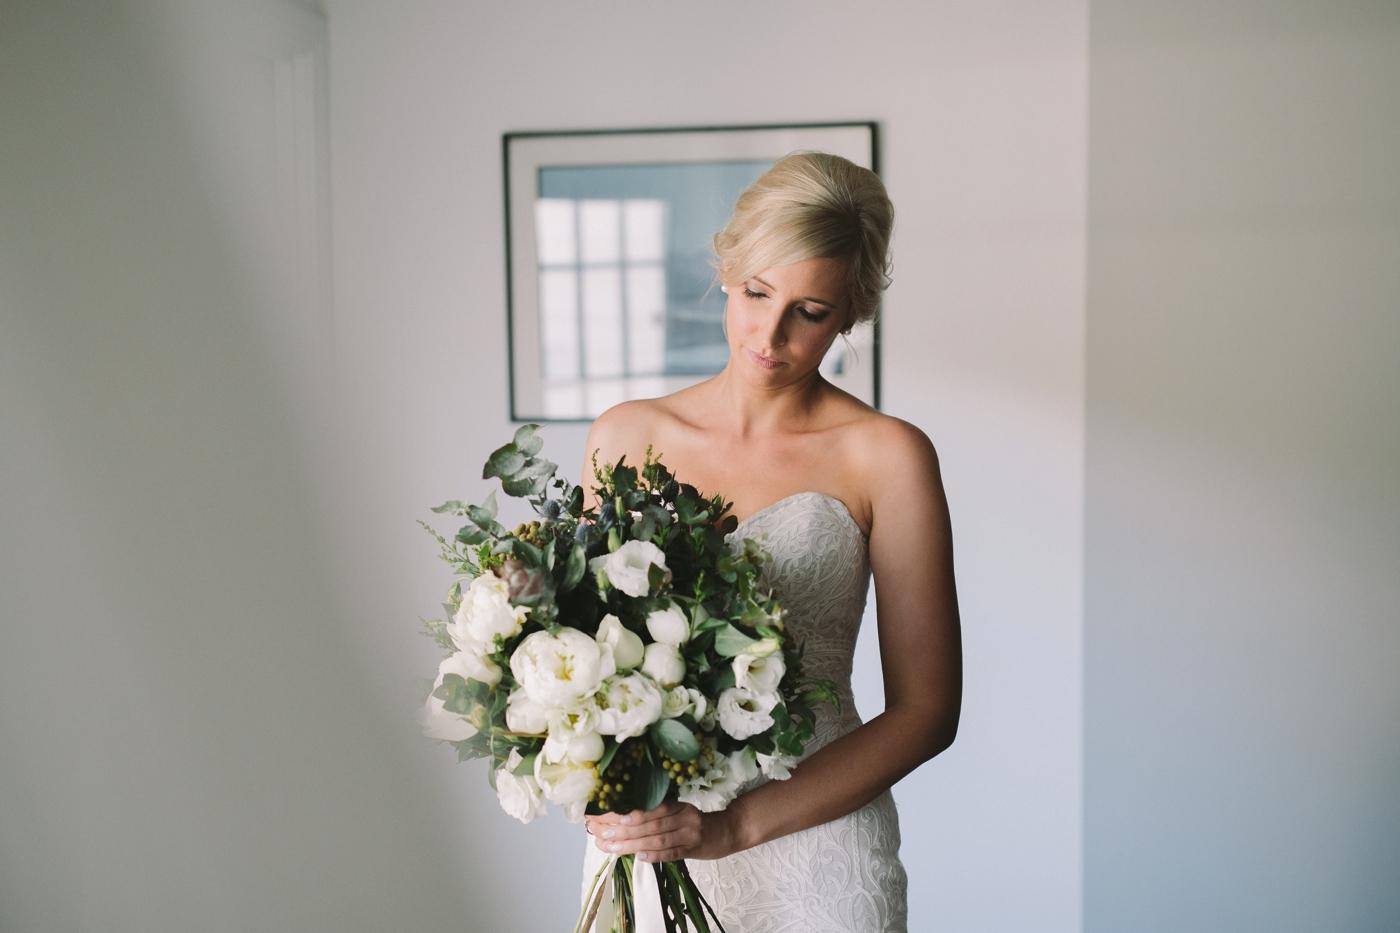 Lauren & Max - Marybank Estate Wedding - Natural wedding photographer in Adelaide - www.katherineschultzphotography.com 50